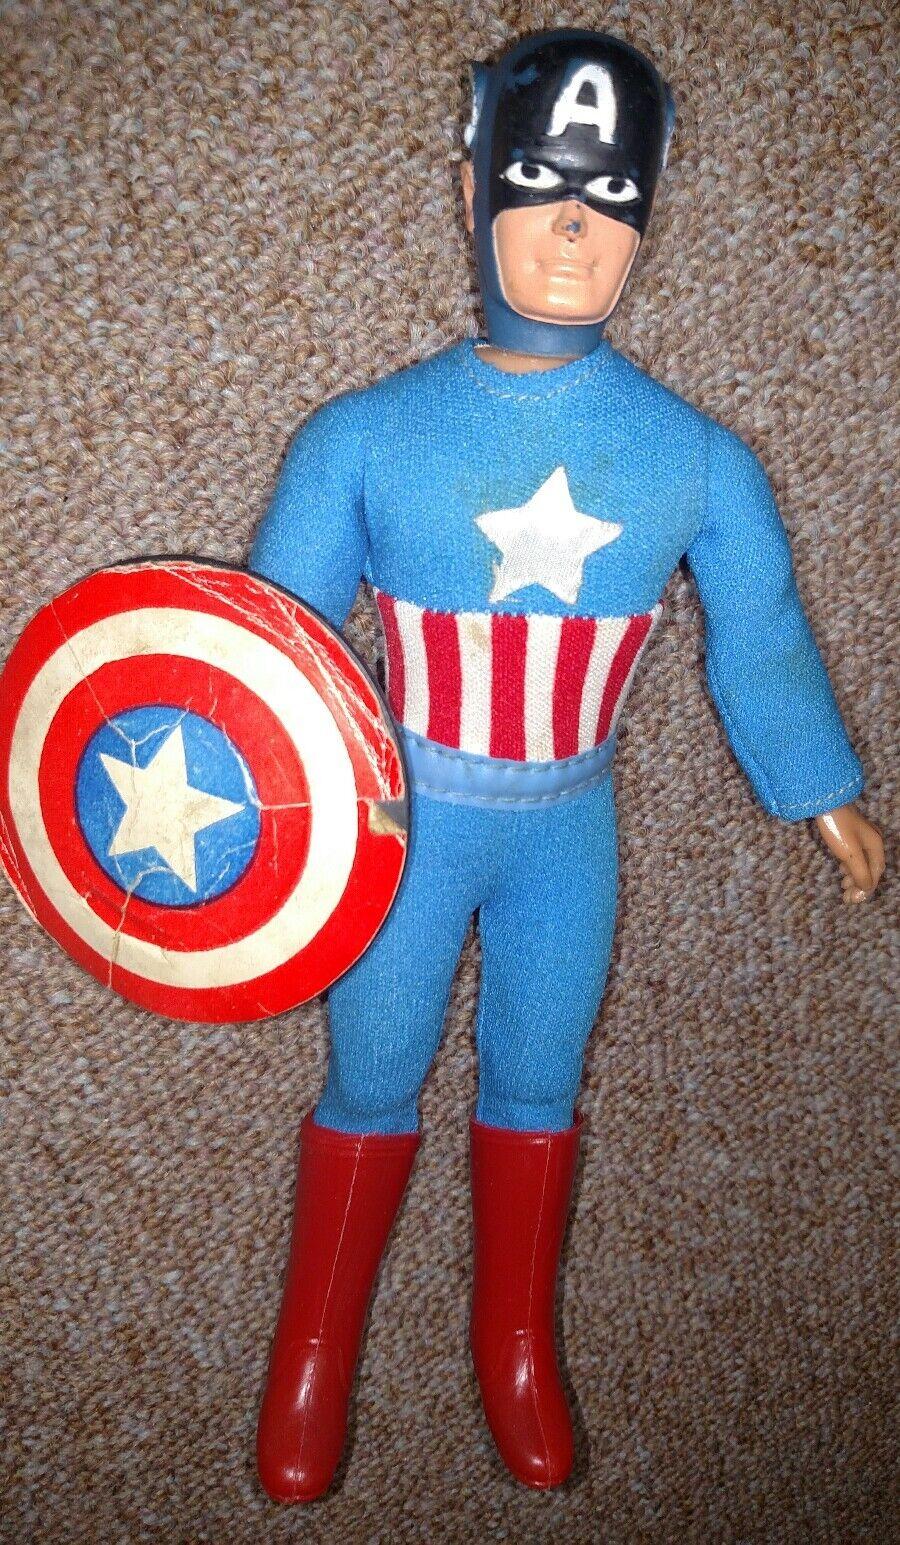 Vintage Mego WGSH 8  World's Greatest Super Heroes Avengers Captain America